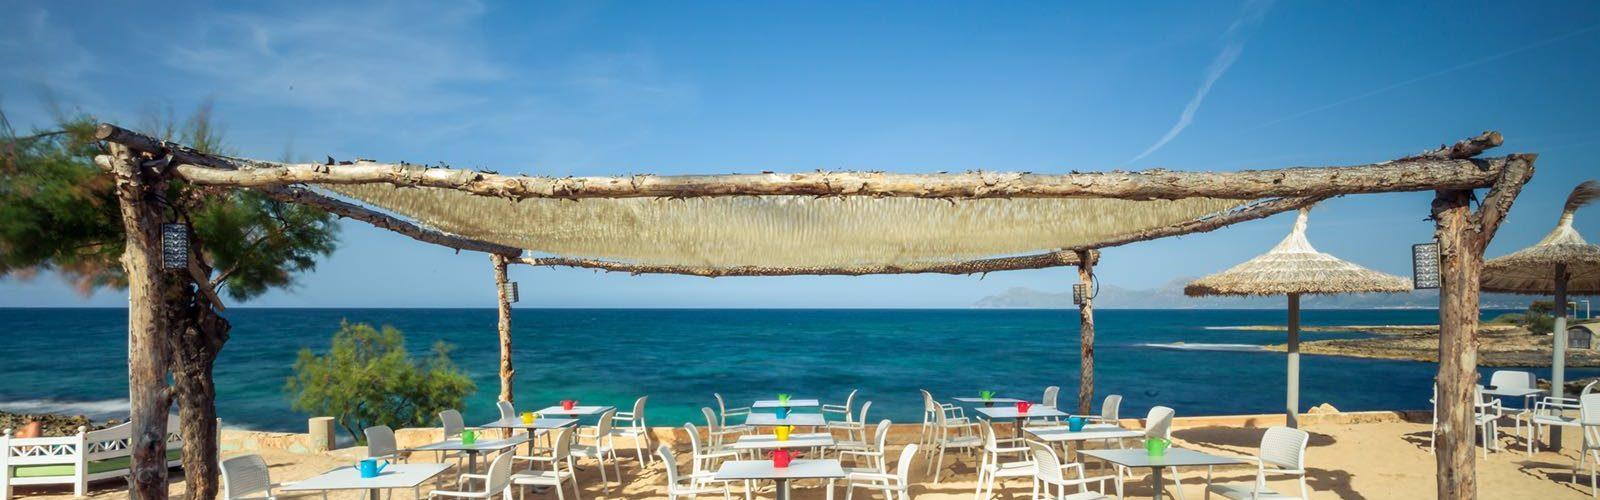 Qué ver en Mallorca